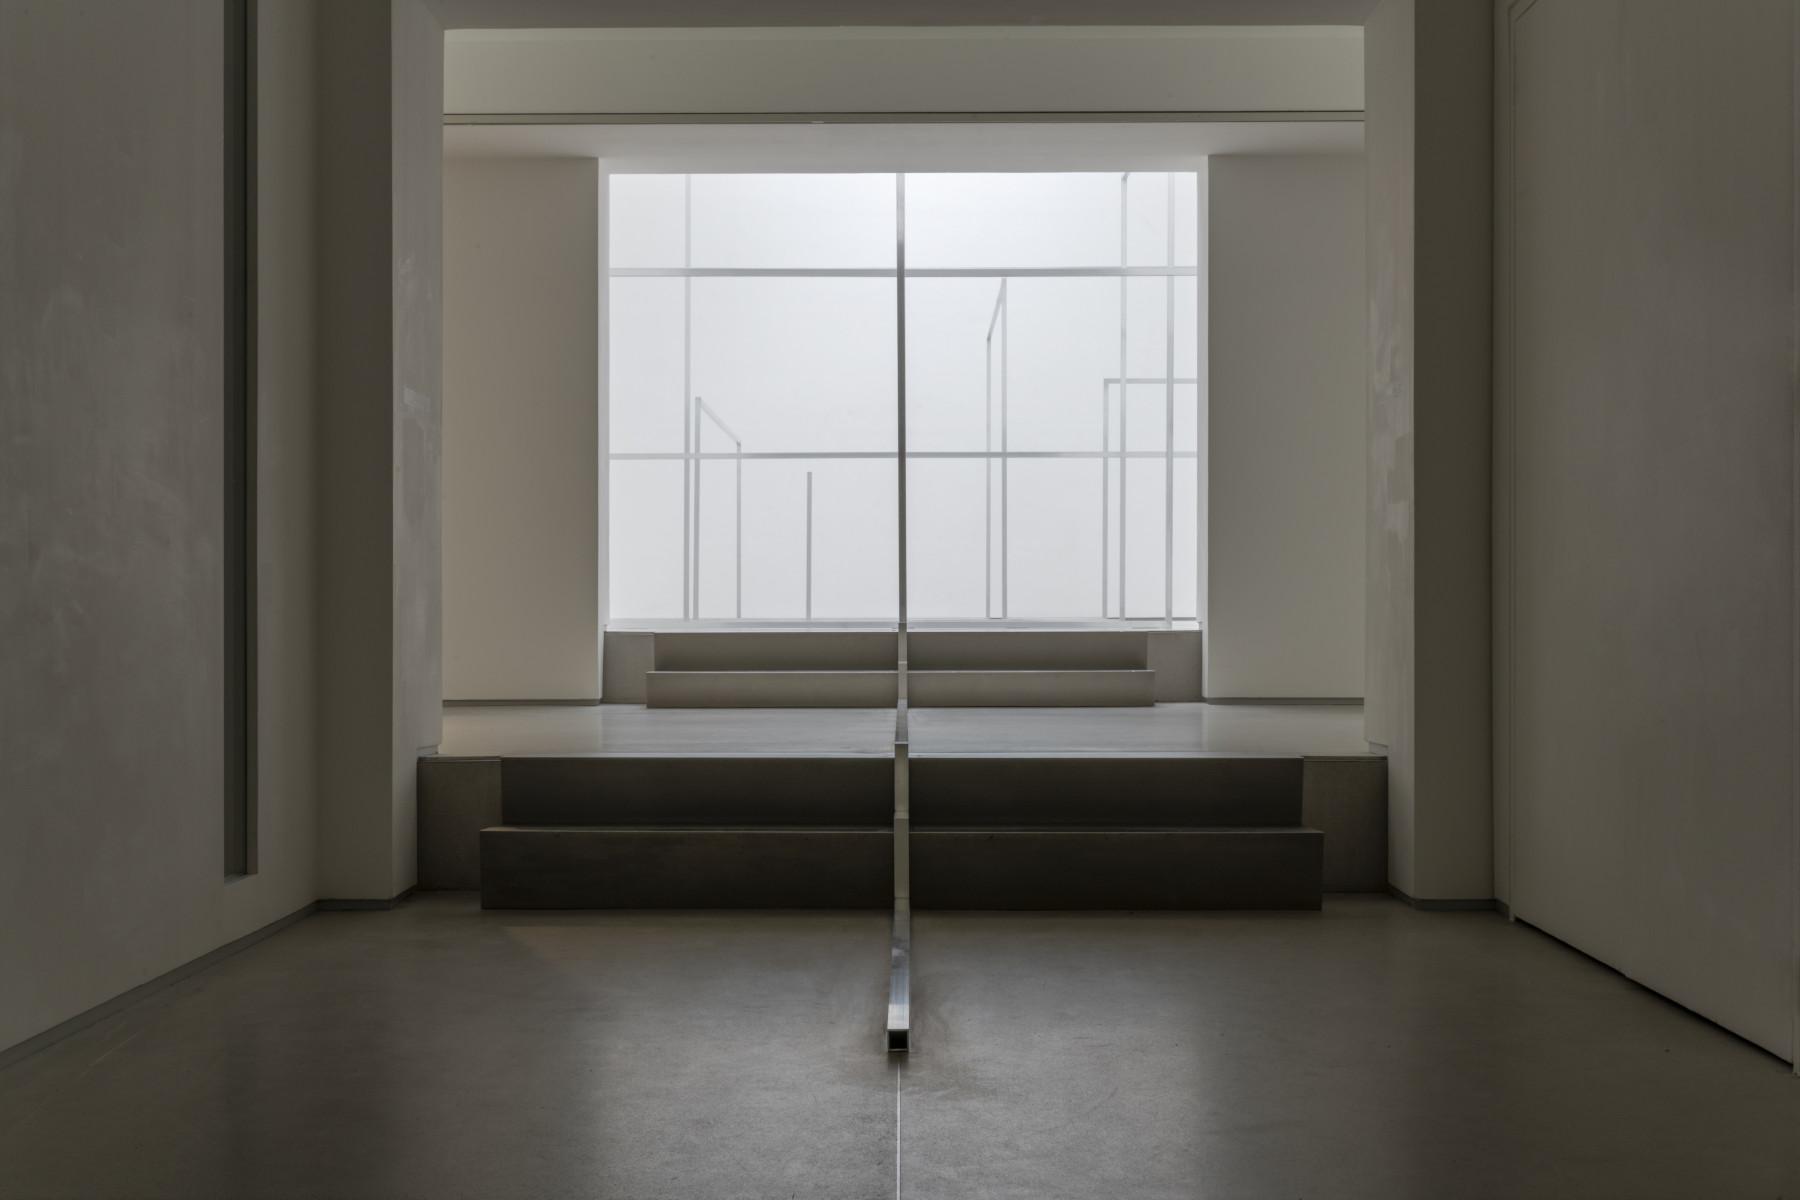 Galerie Thaddaeus Ropac Marais Antony Gormley 1